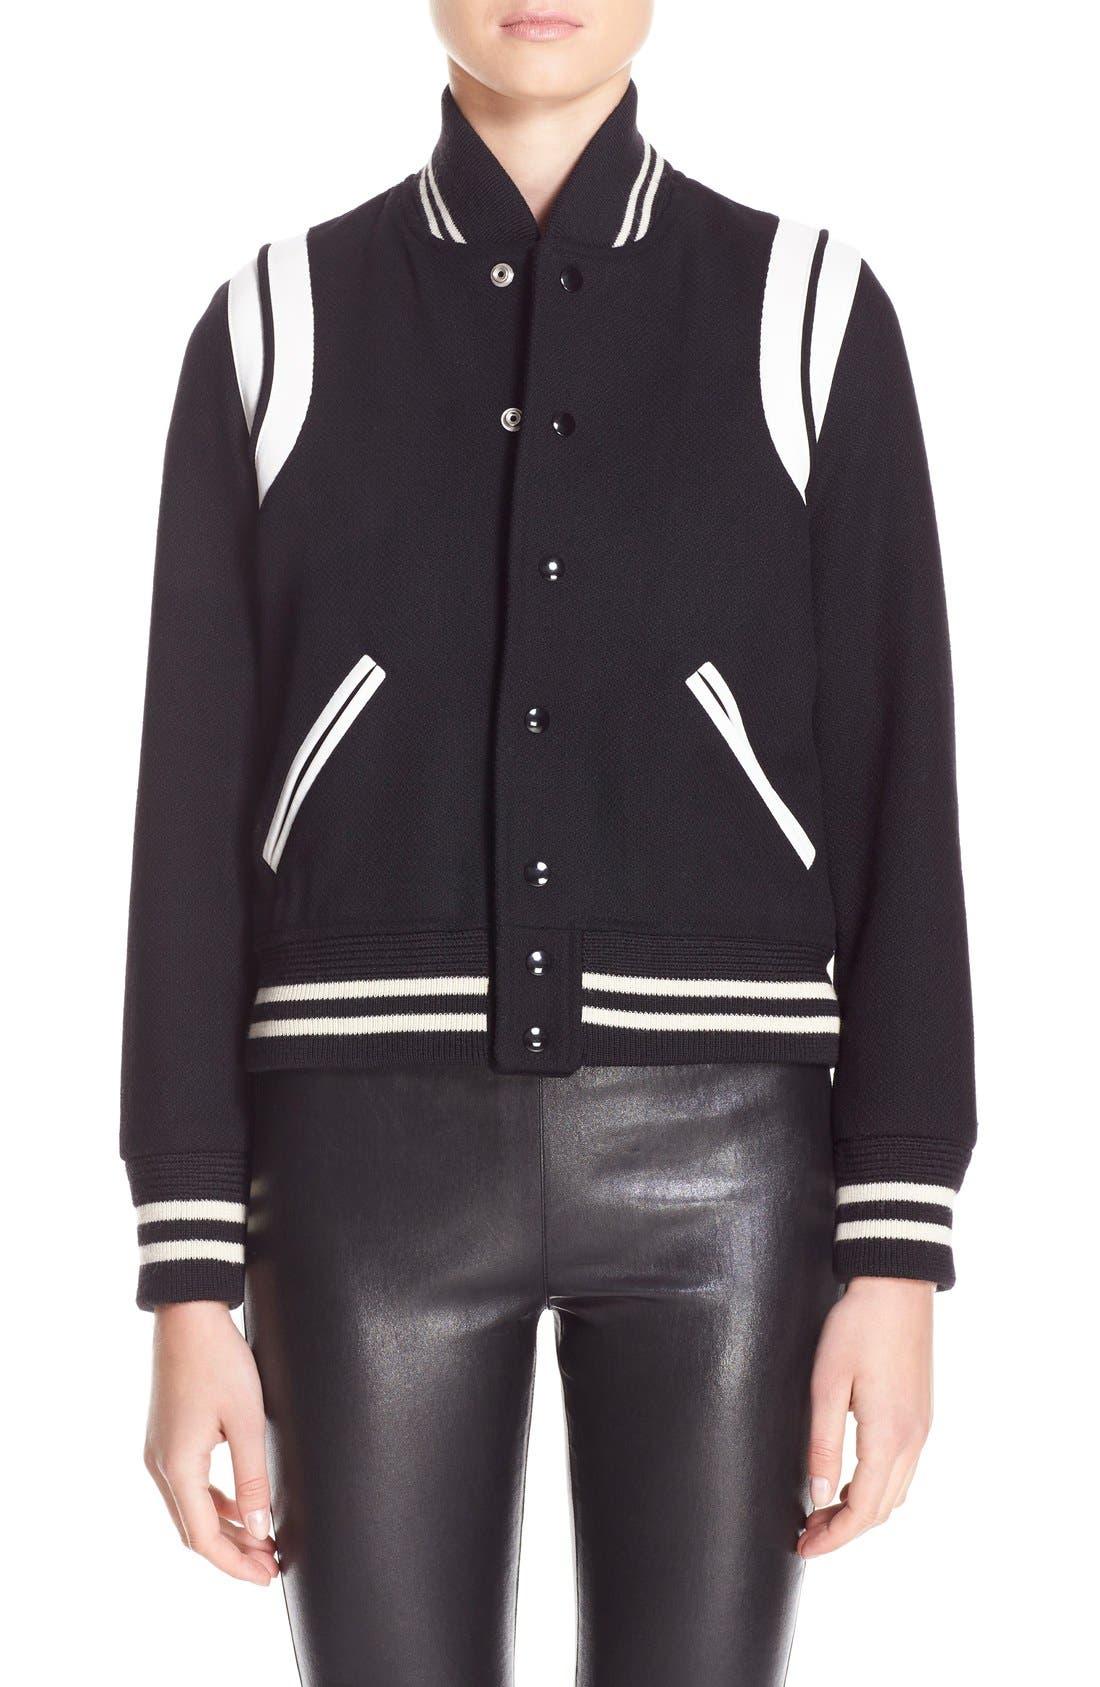 Main Image - Saint Laurent 'Teddy' White Leather Trim Bomber Jacket